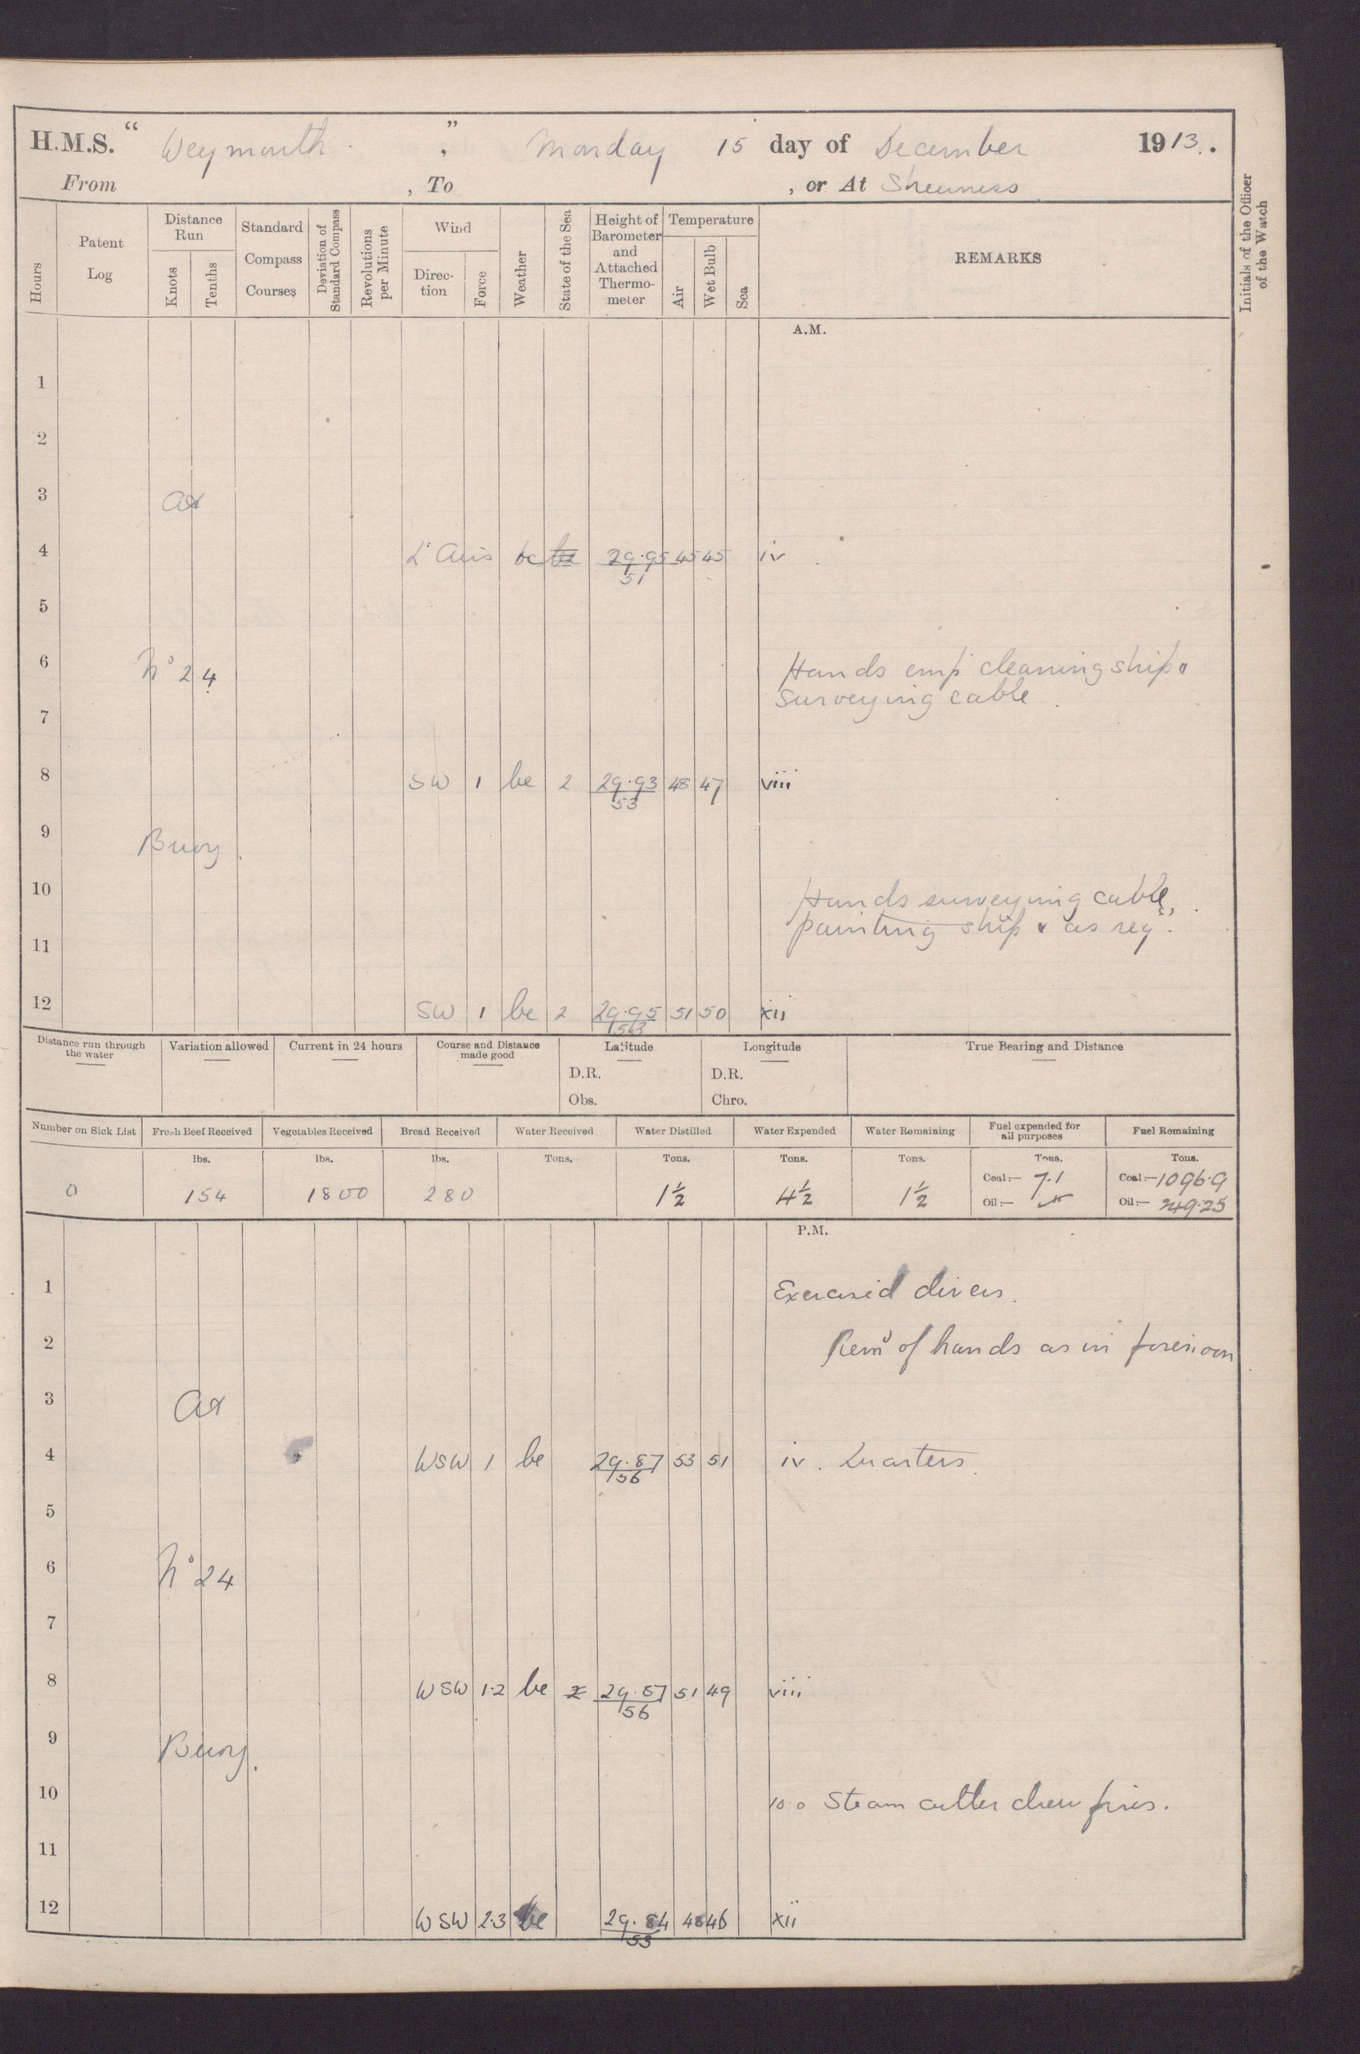 Hms Weymouth Light Cruiser British Warships Of World War 1 Chattanooga M2 Wiring Diagram 4caf8cbfcadfd34197037bf0 Http Oldweathers3amazonawscom Adm 53 68440 039